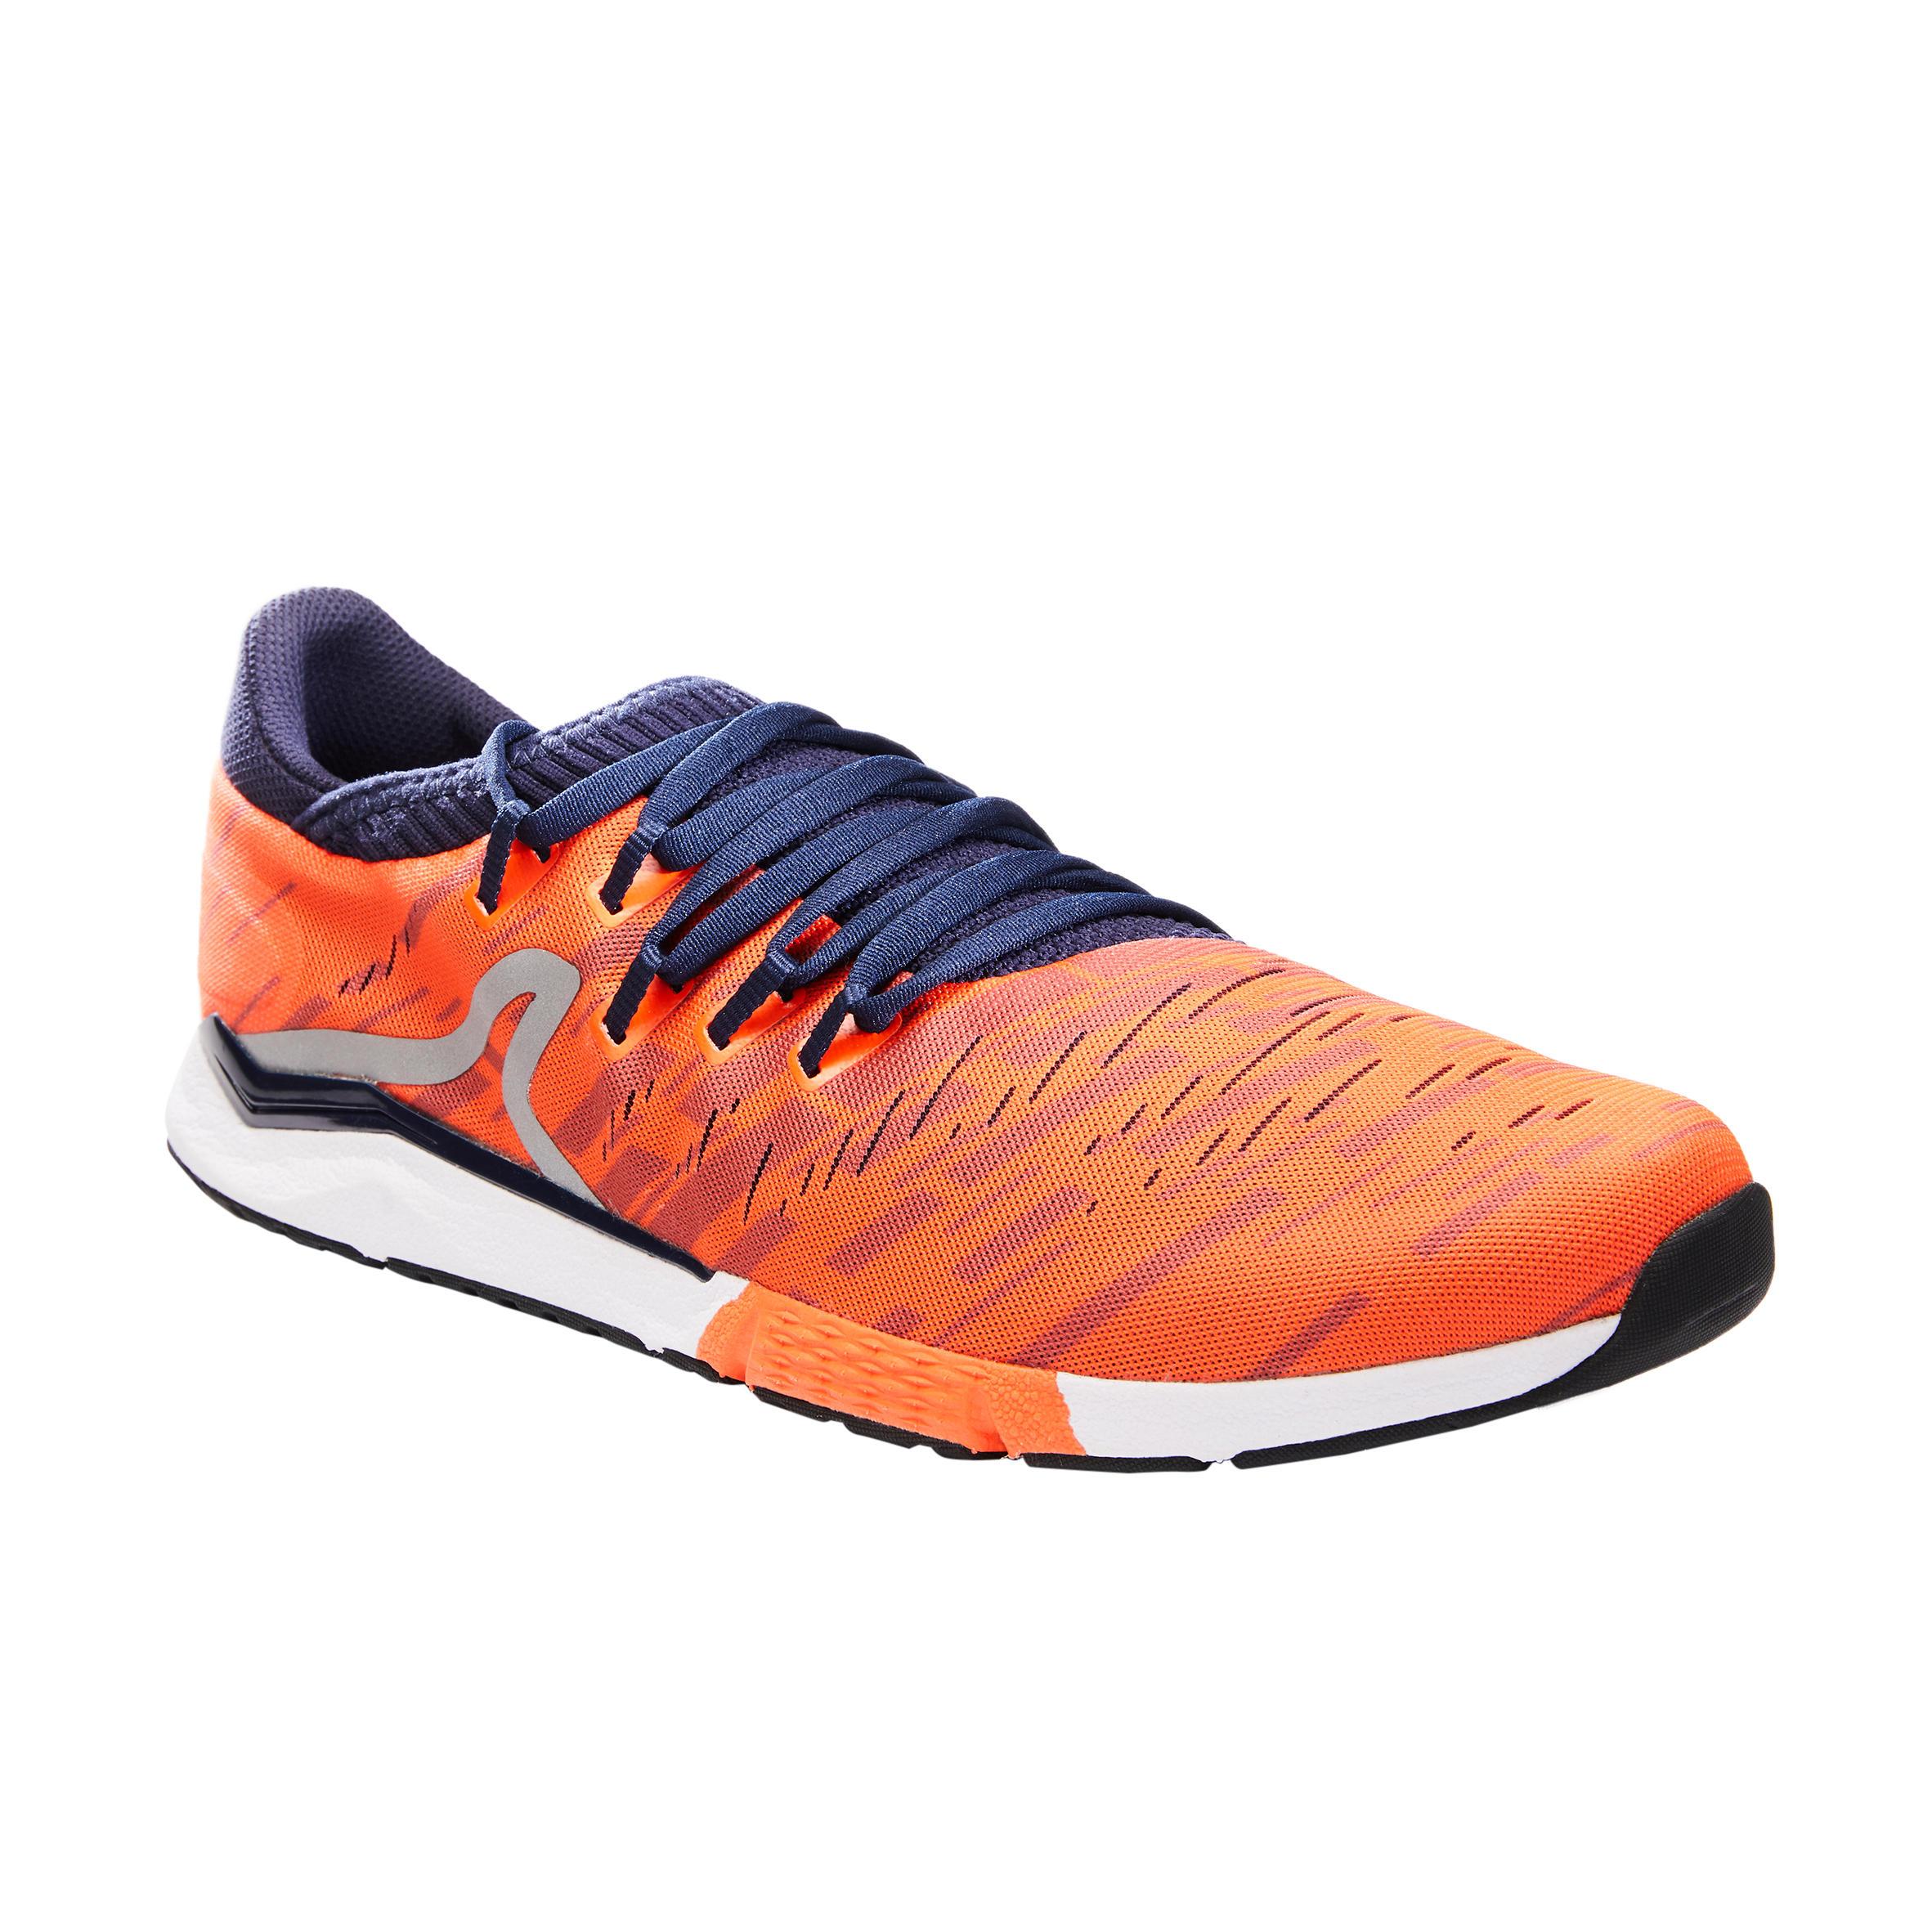 Walkingschuhe athletisches Gehen RW900 Race | Schuhe > Sportschuhe > Walkingschuhe | Newfeel